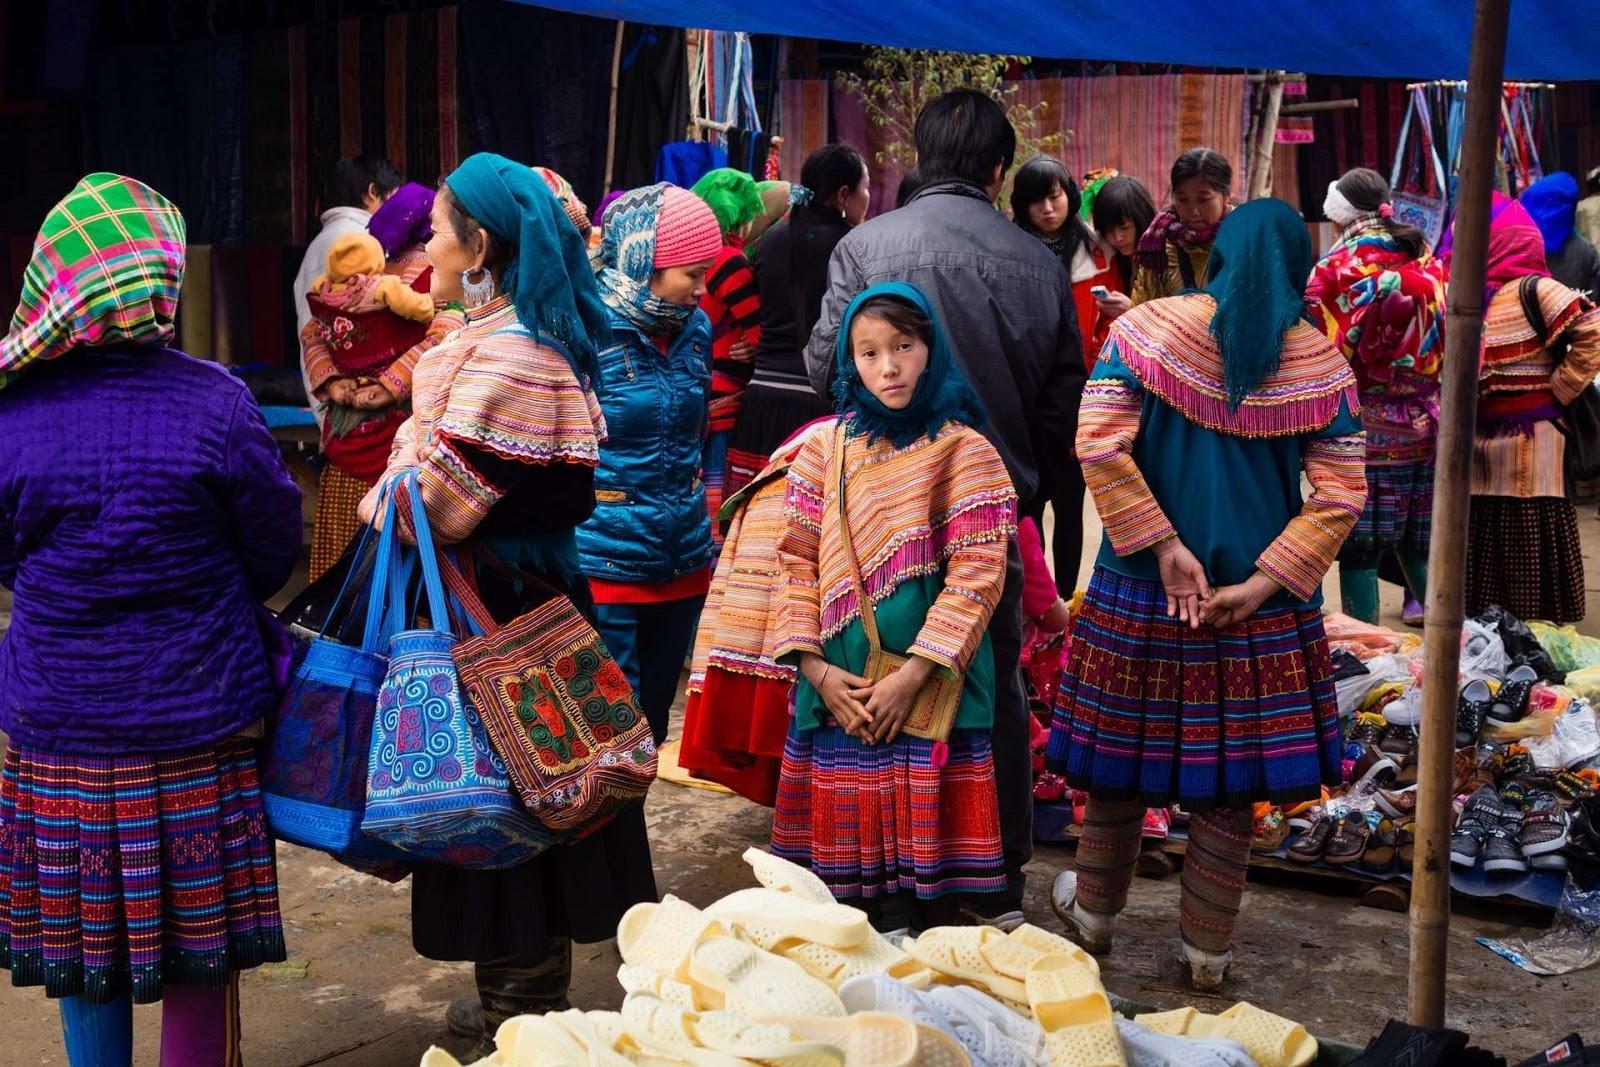 The romantic Sapa market